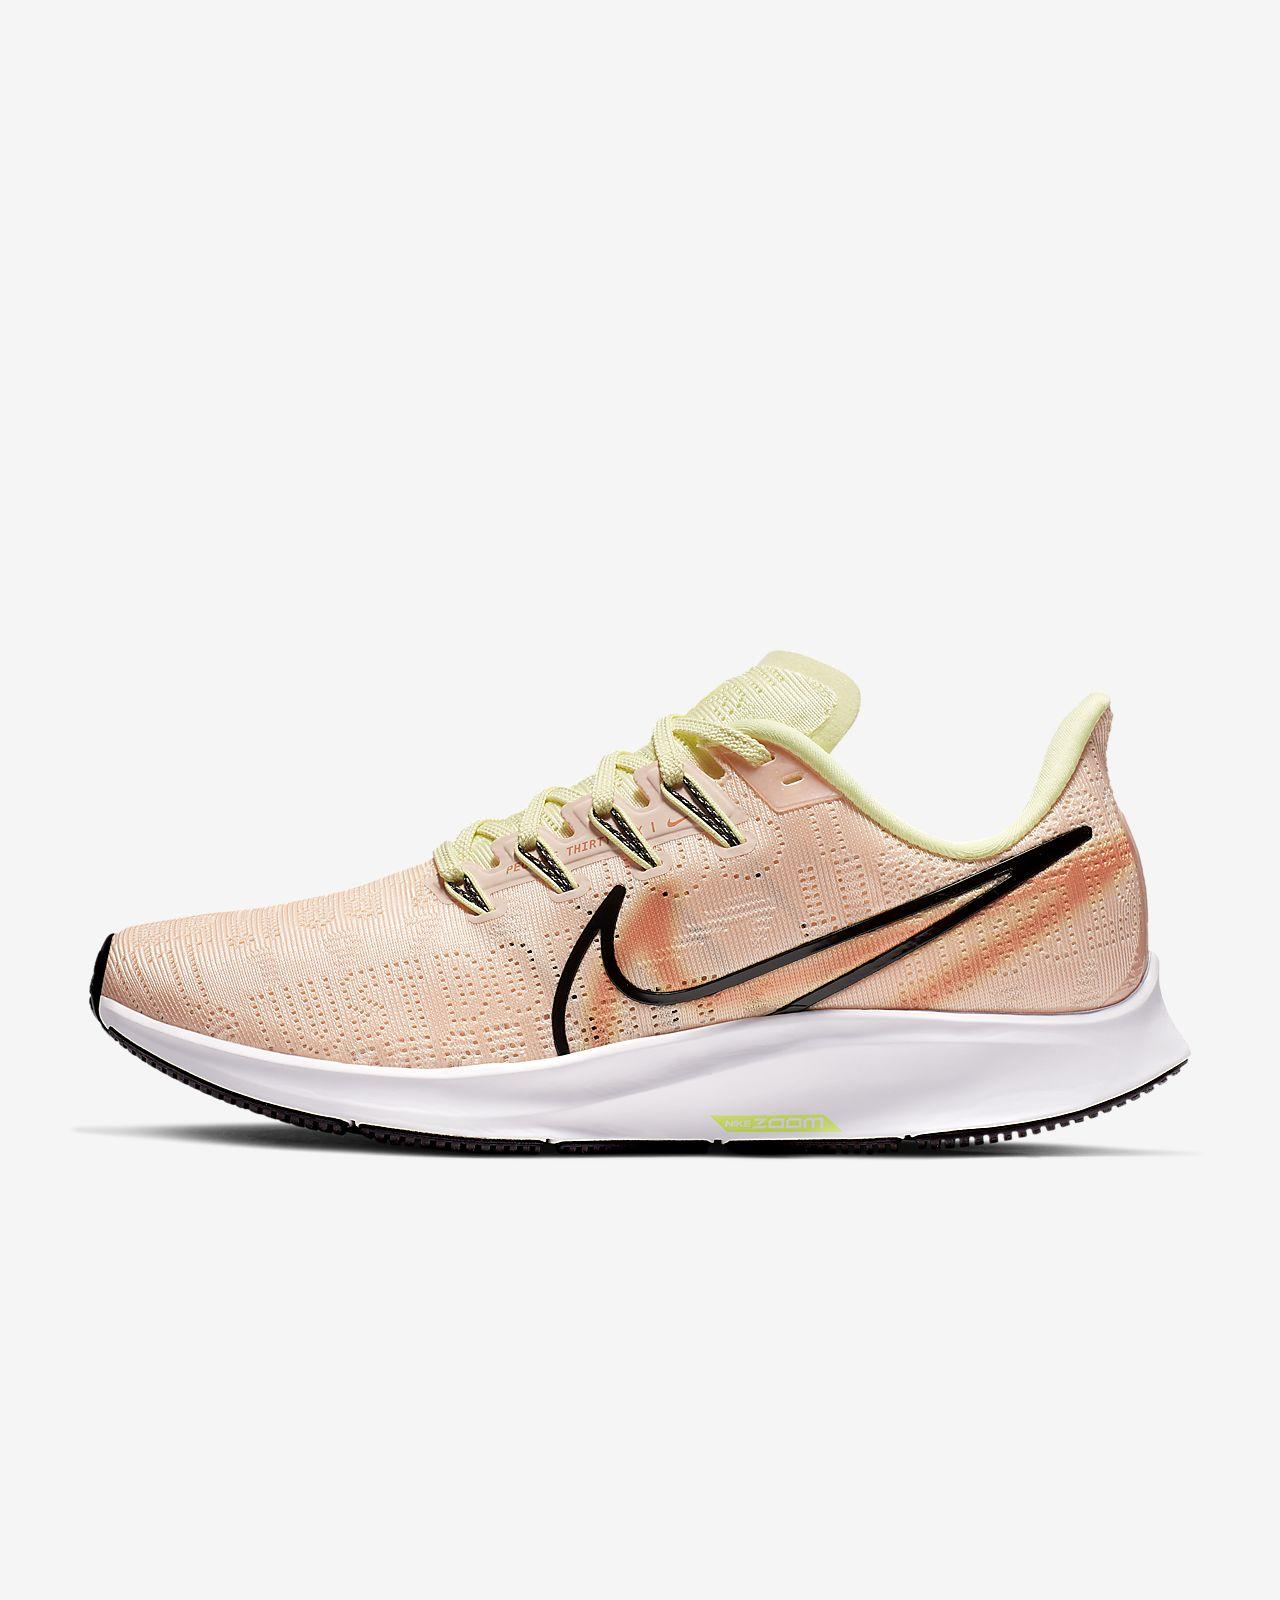 Nike Air Zoom Pegasus 36 Premium Rise Women's Running Shoe